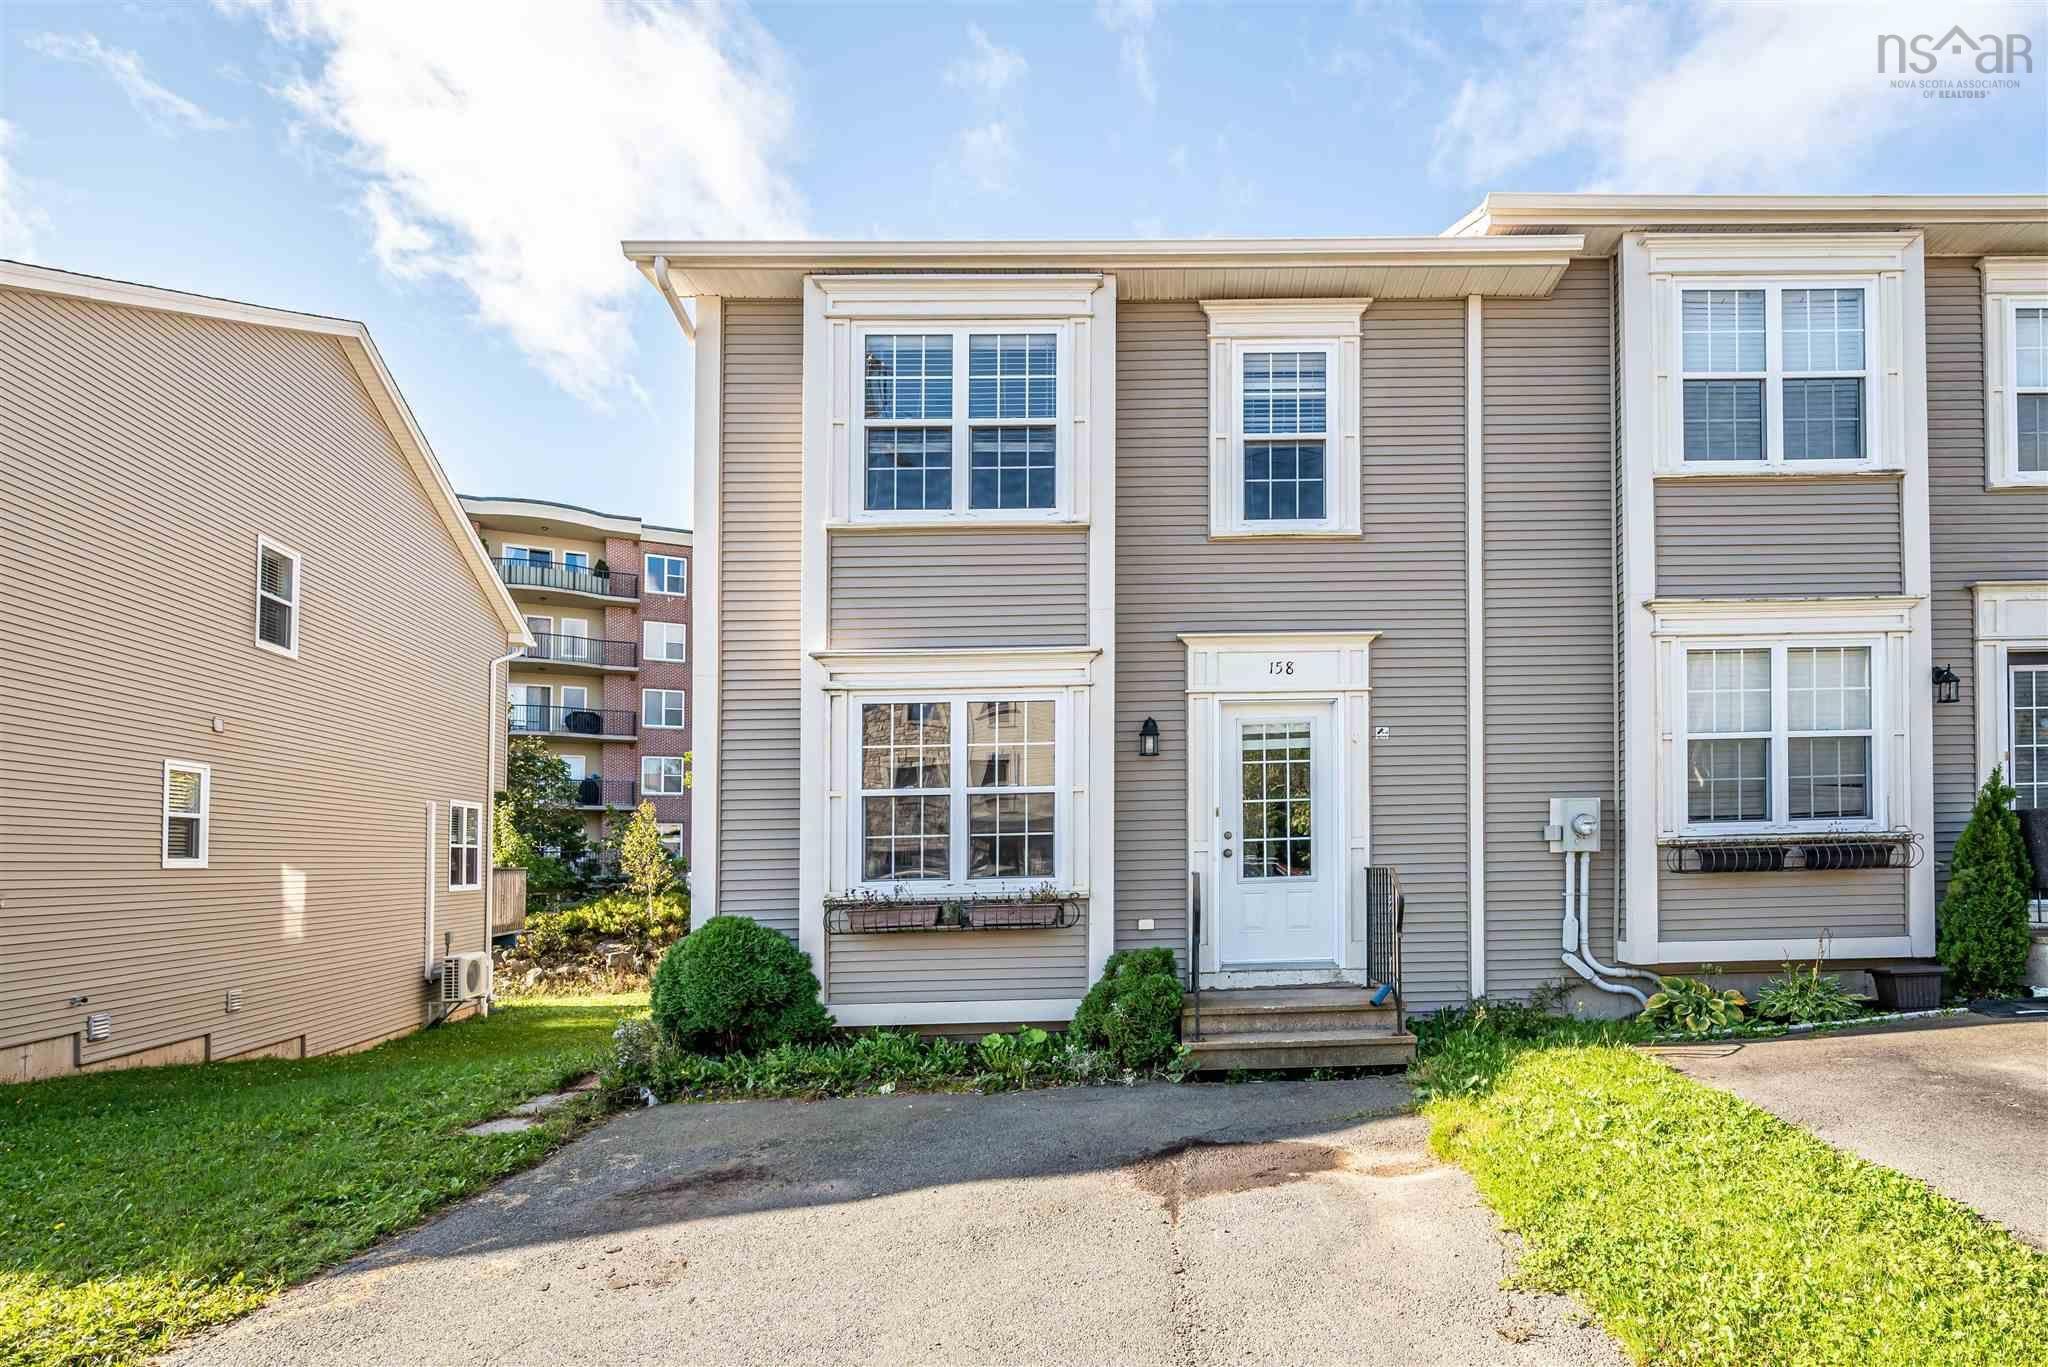 Main Photo: 158 Transom Drive in Halifax: 5-Fairmount, Clayton Park, Rockingham Residential for sale (Halifax-Dartmouth)  : MLS®# 202125638